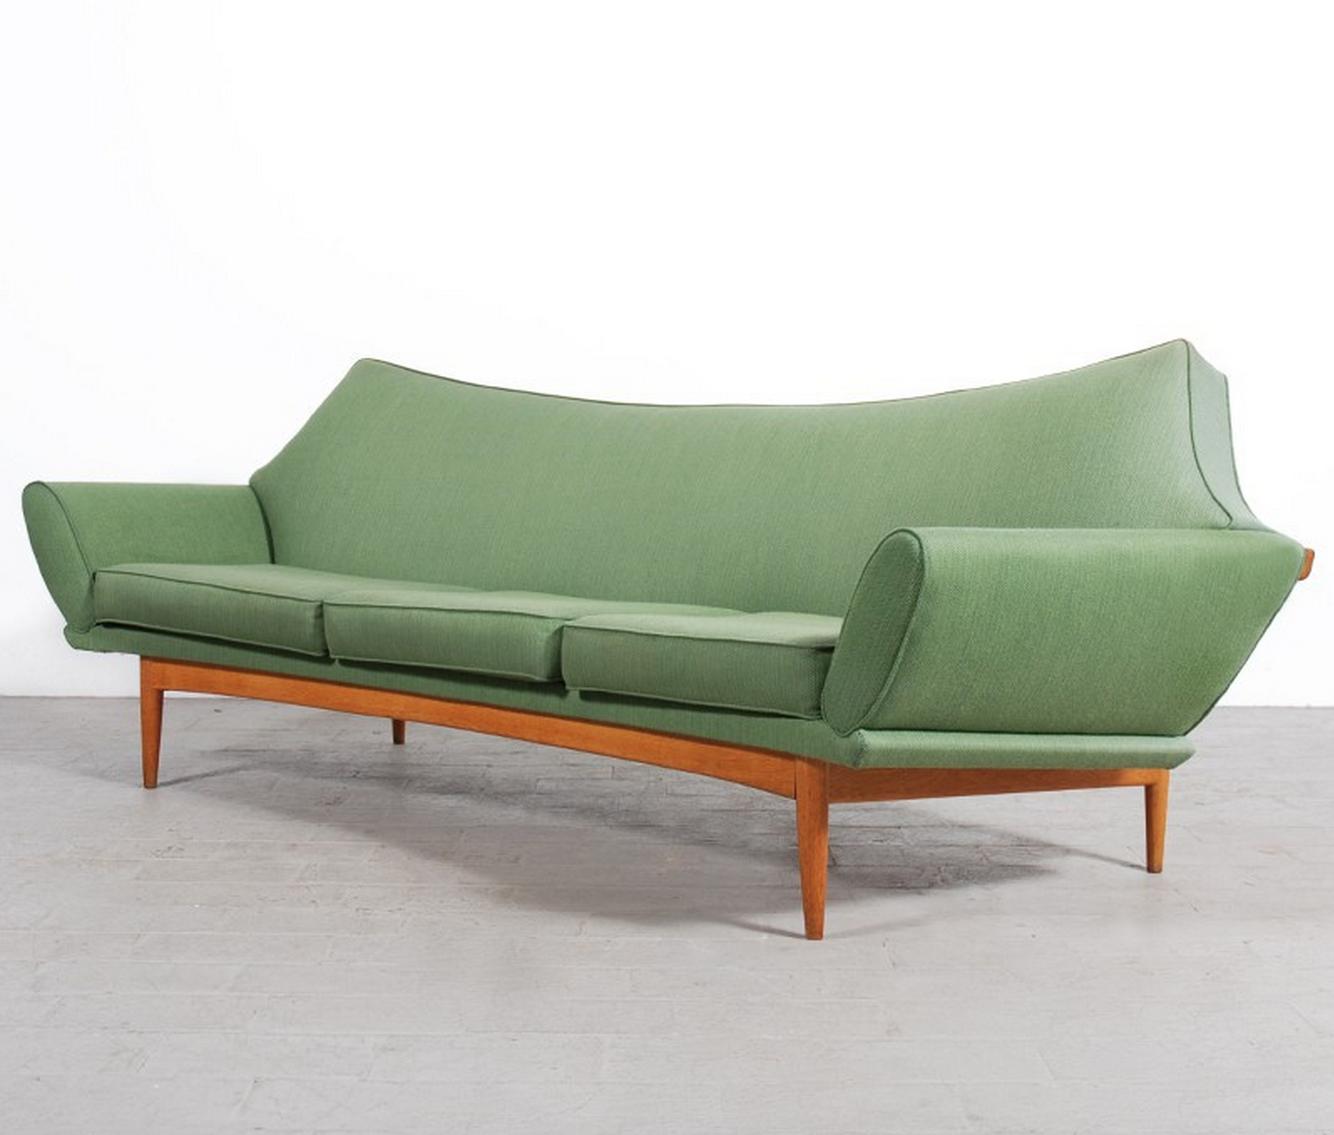 Mid Century Retro Vintage Johannes Andersen Teak Sofa Couch Lounge 3 Seater 1960s Retro Furniture Design Modern Mid Century Modern Decor Modern Style Furniture